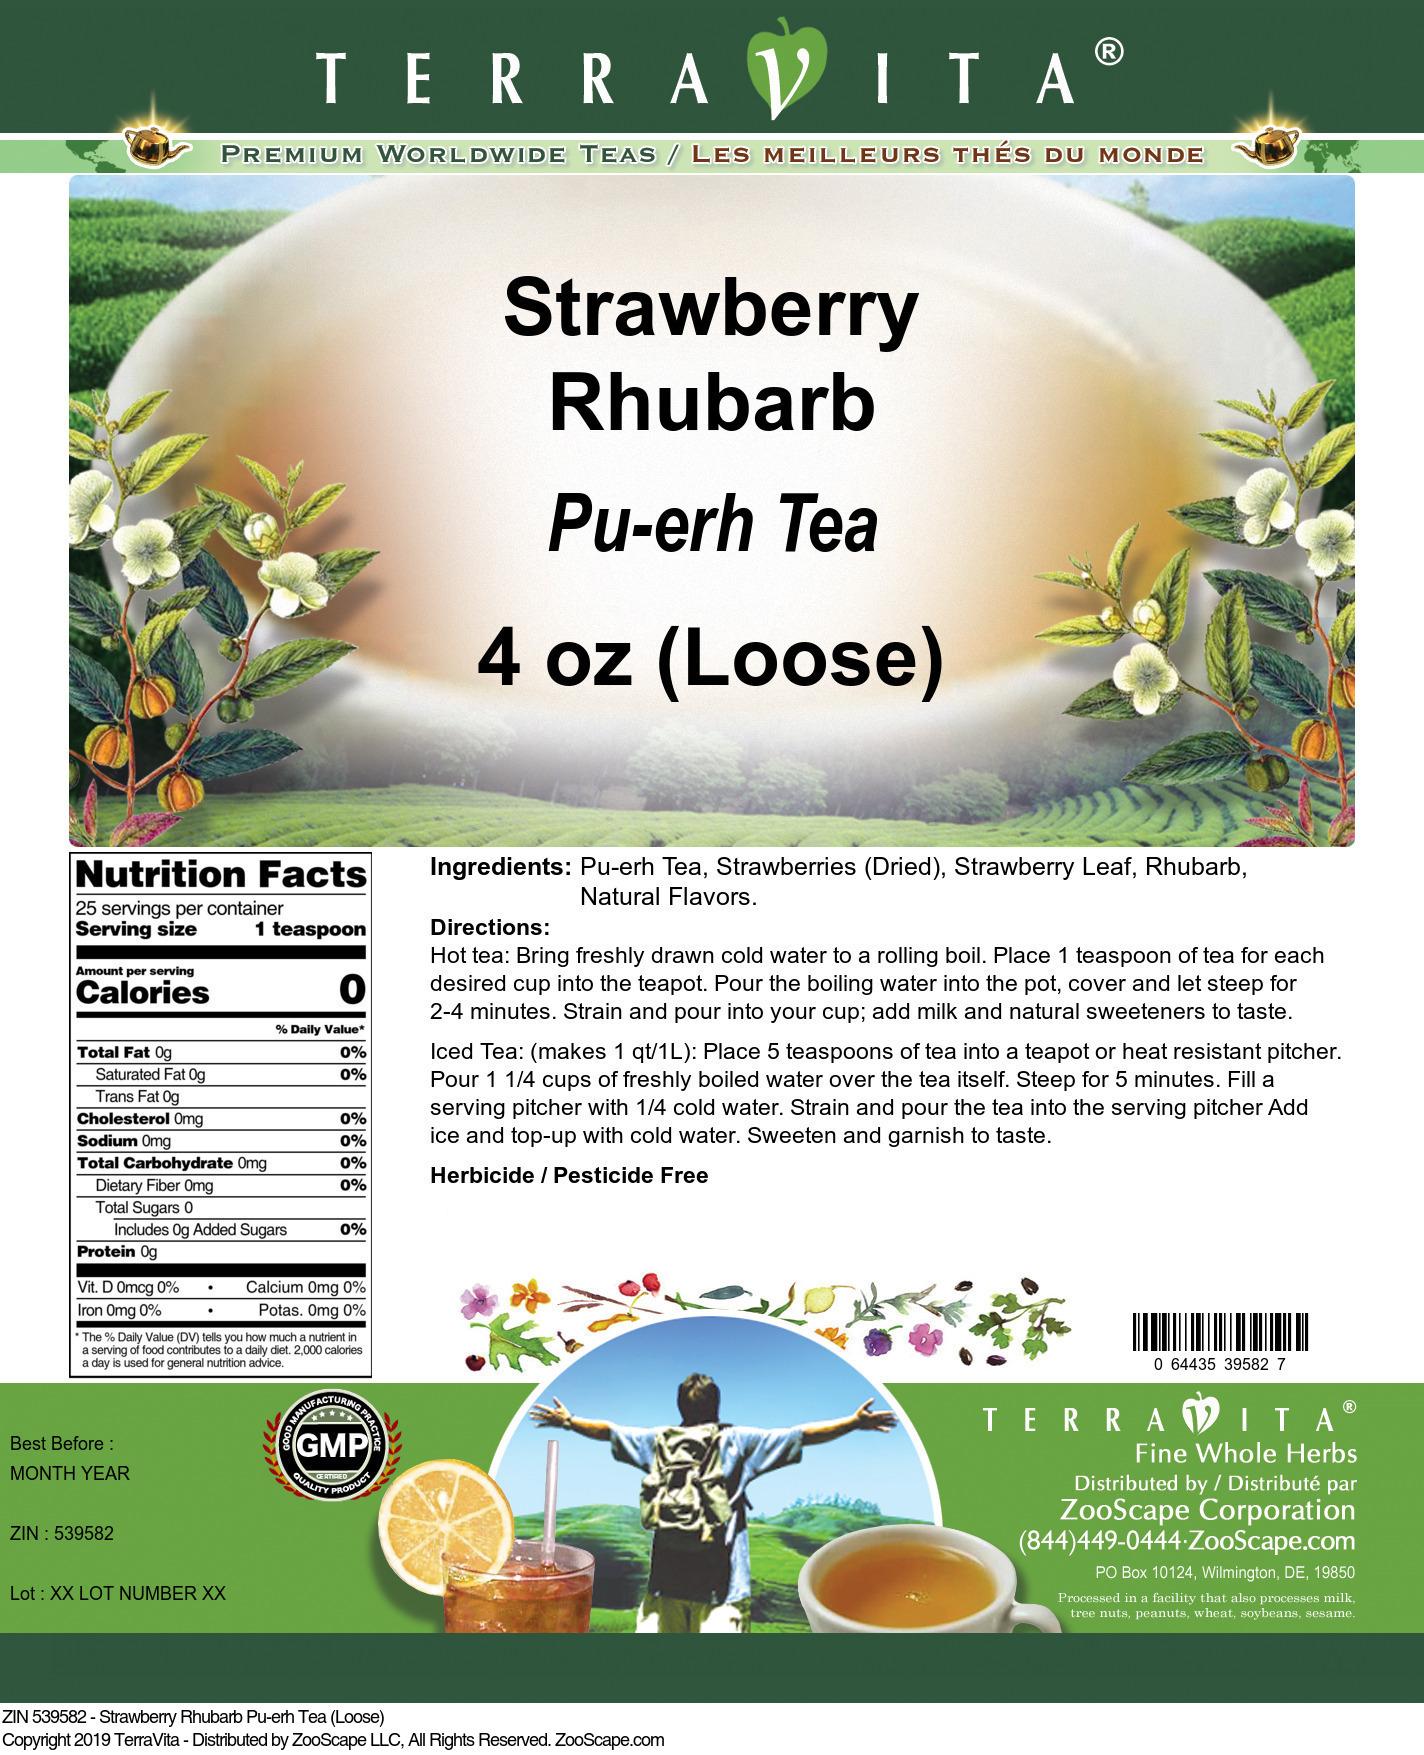 Strawberry Rhubarb Pu-erh Tea (Loose)